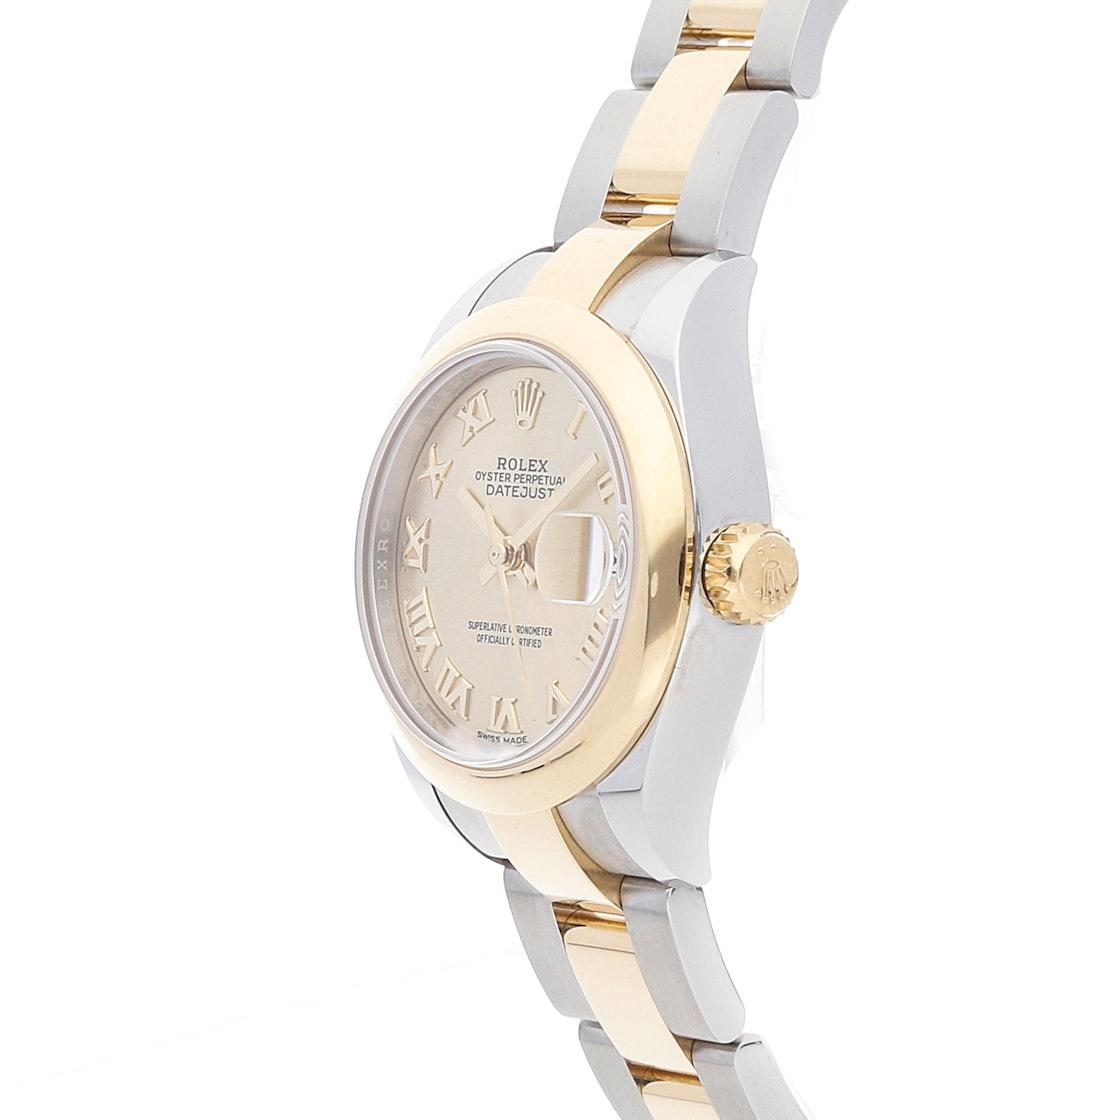 Rolex Lady-Datejust 28 279163